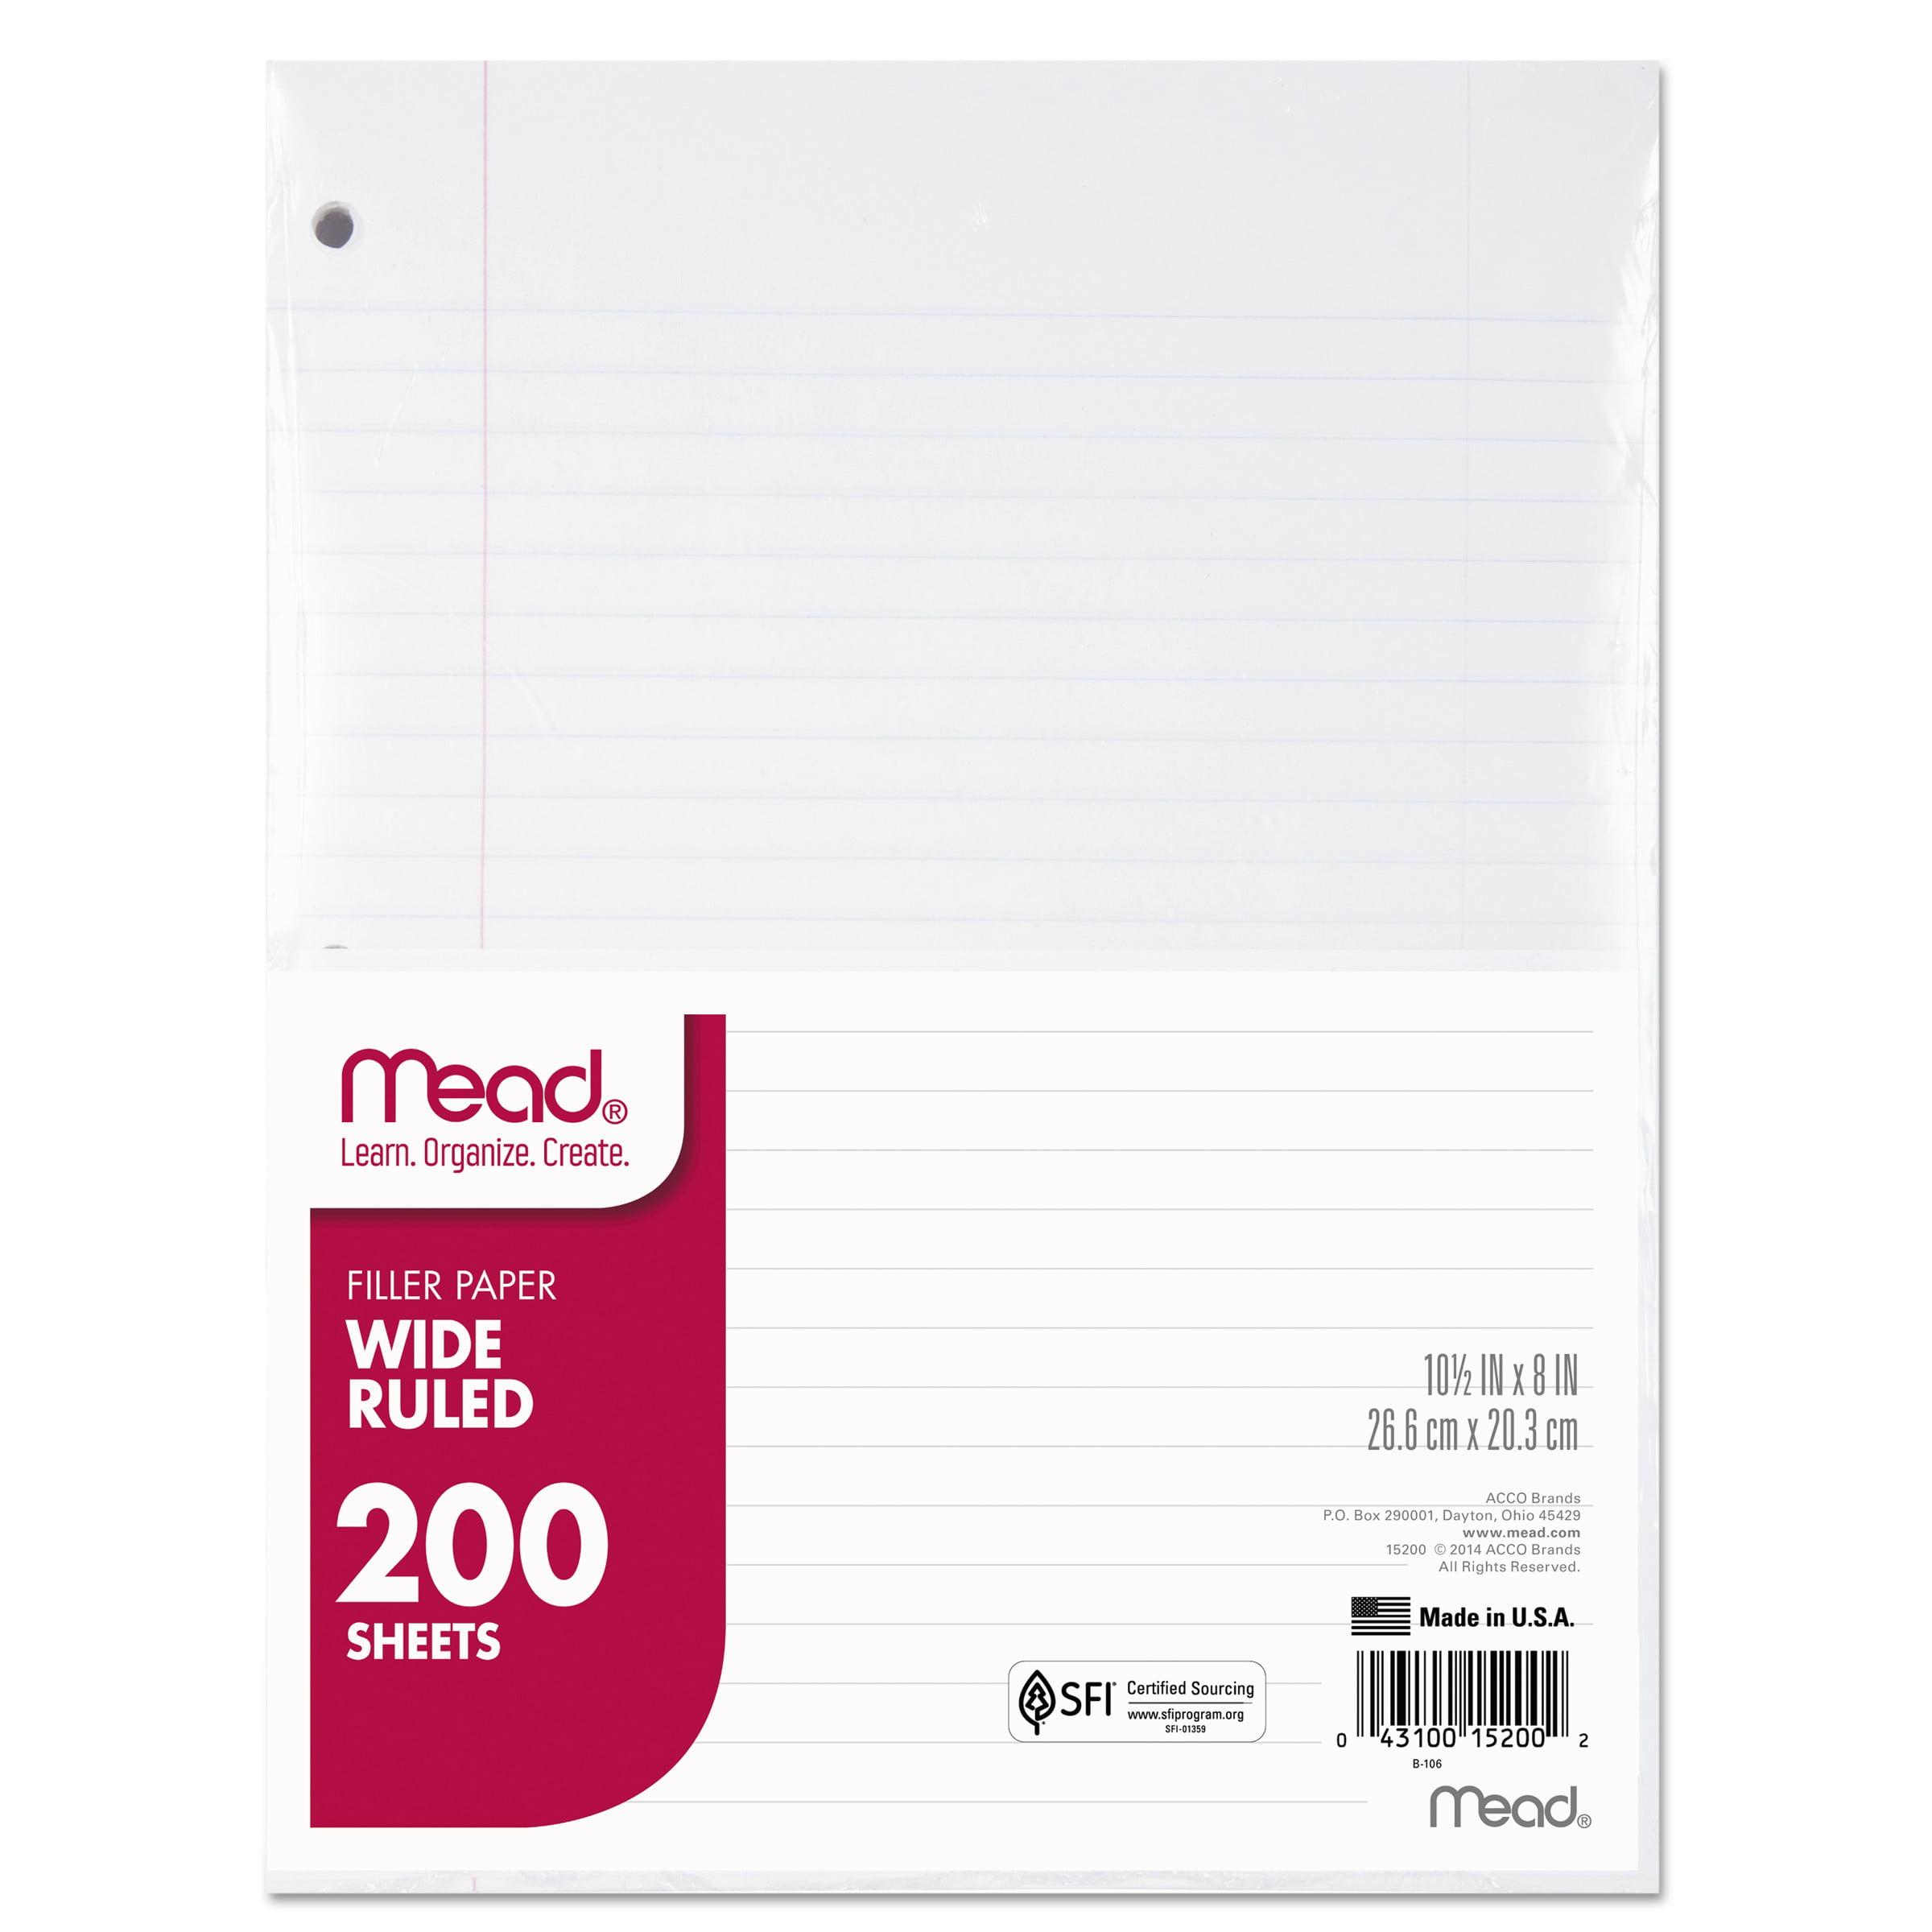 Mead Filler Paper, 15lb, Wide Rule, 3 Hole, 10 1/2 x 8, 200 Sheets -MEA15200